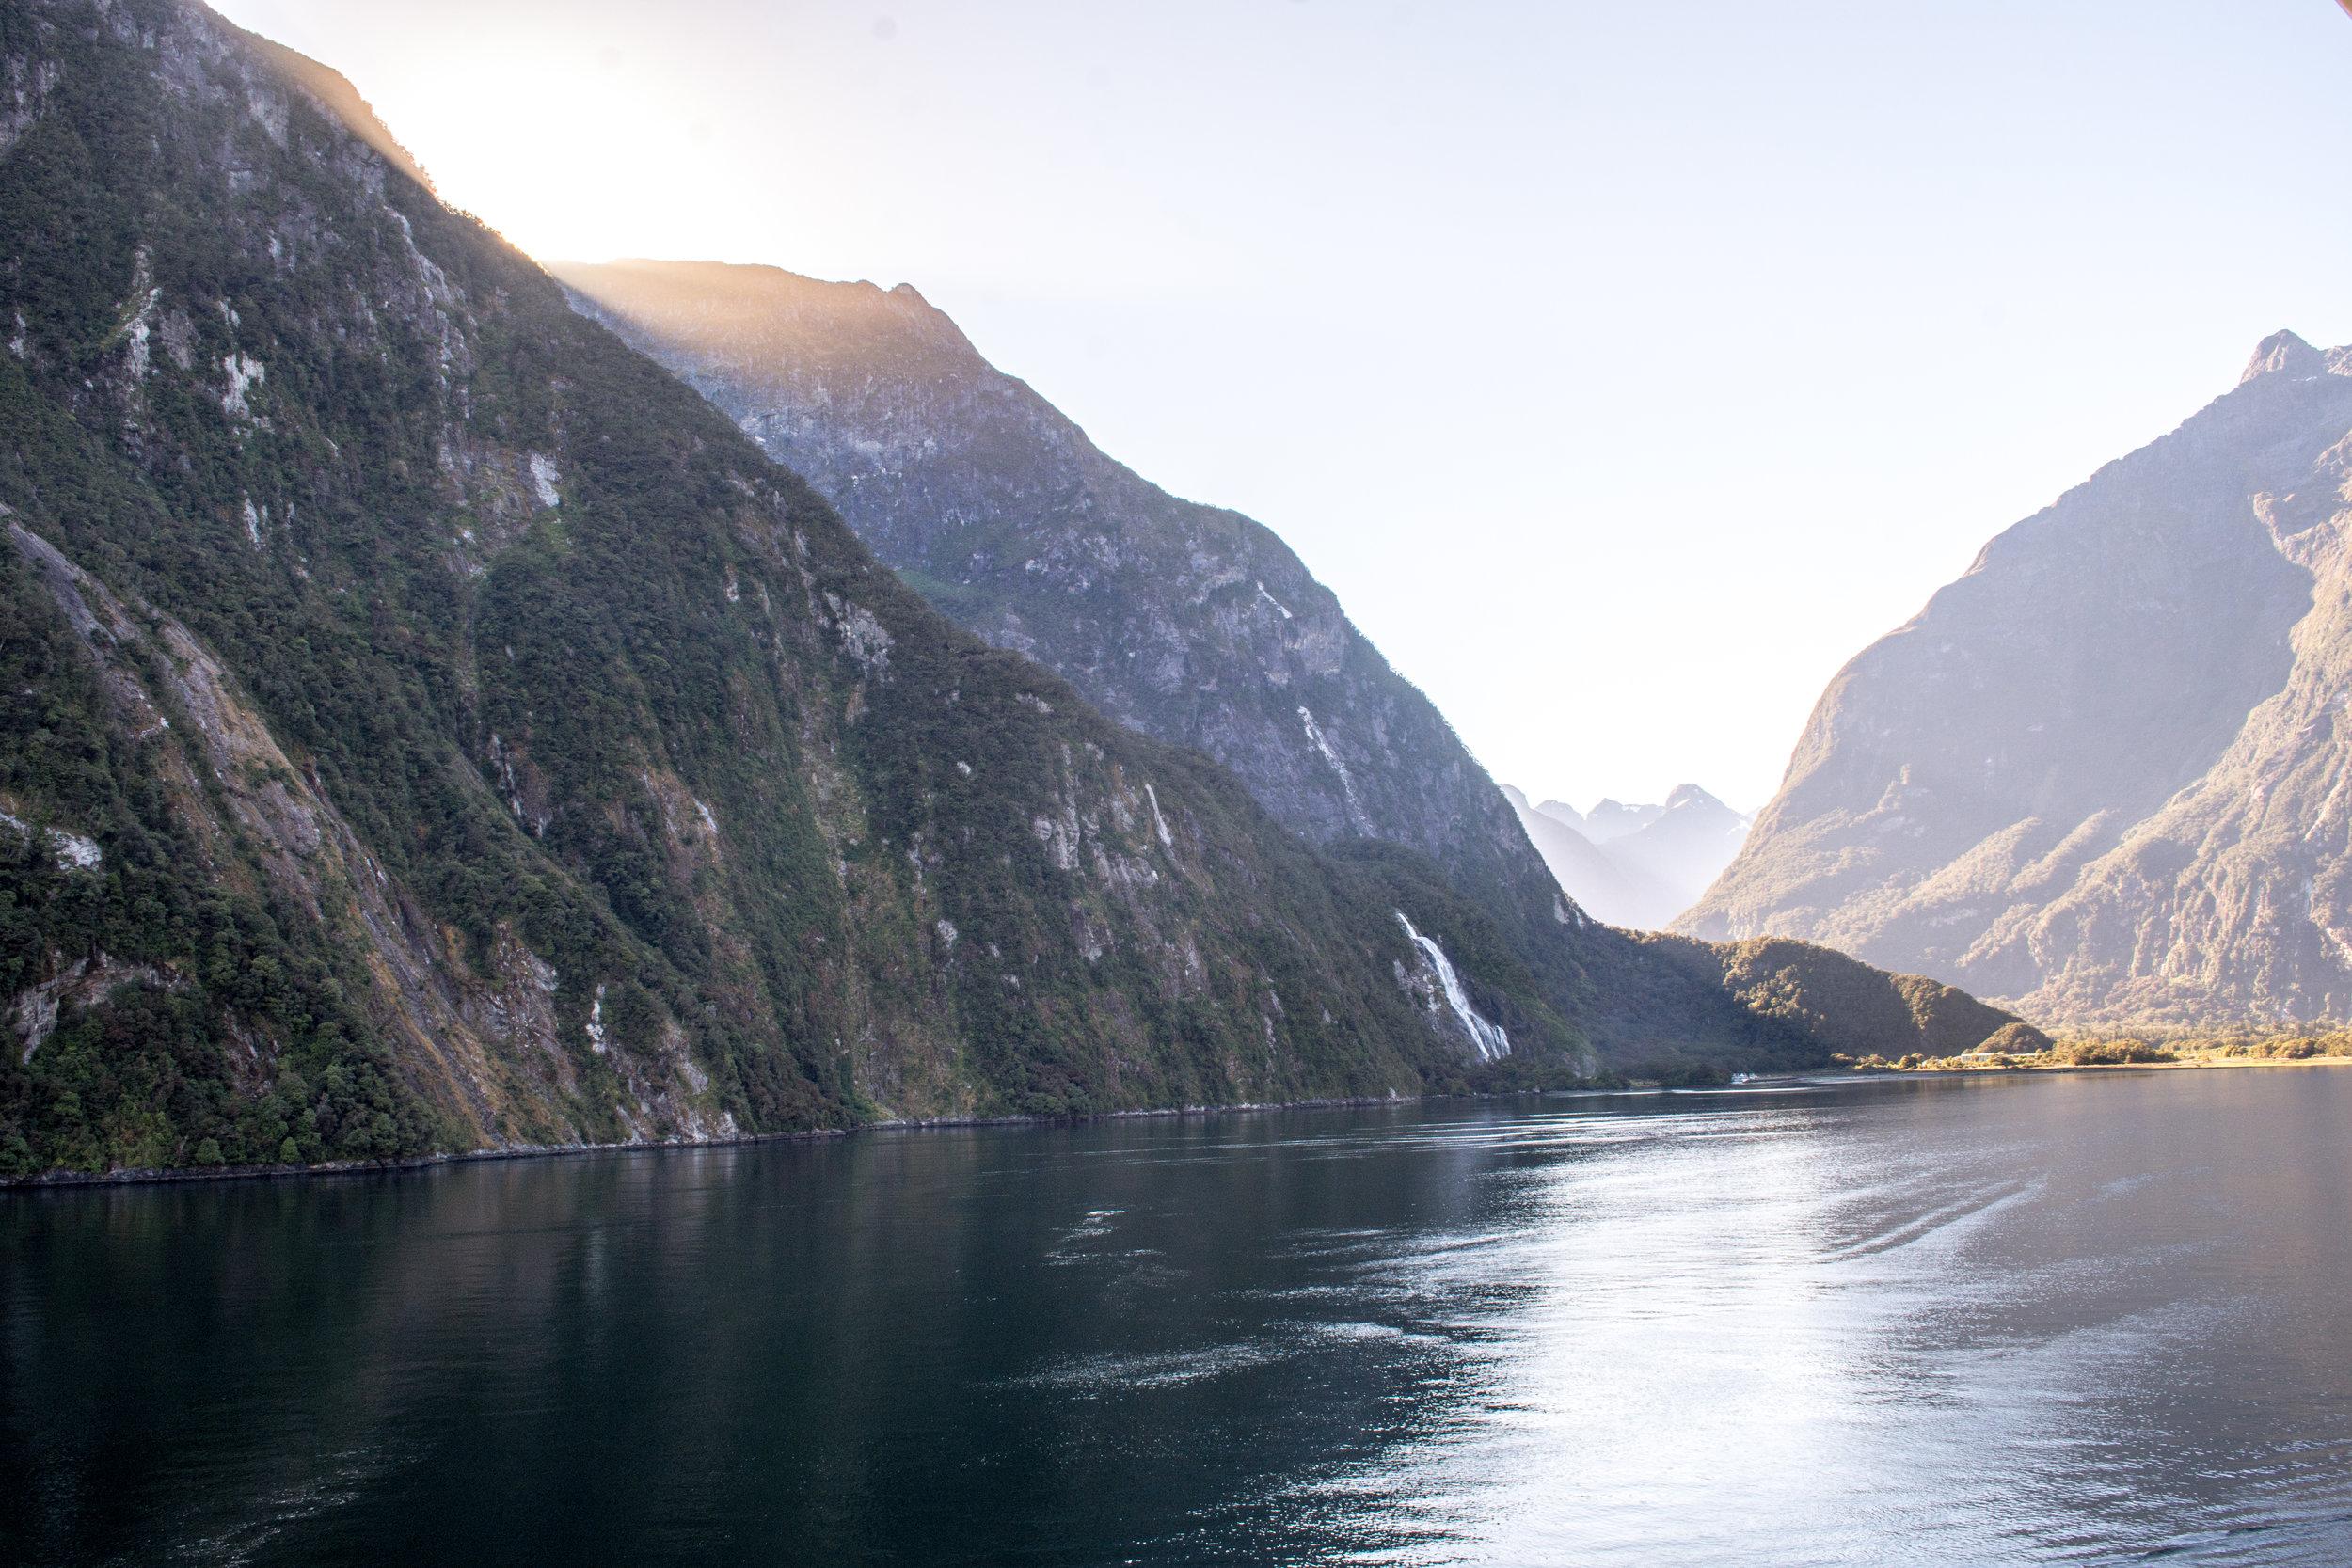 Bowen Falls in Milford Sound